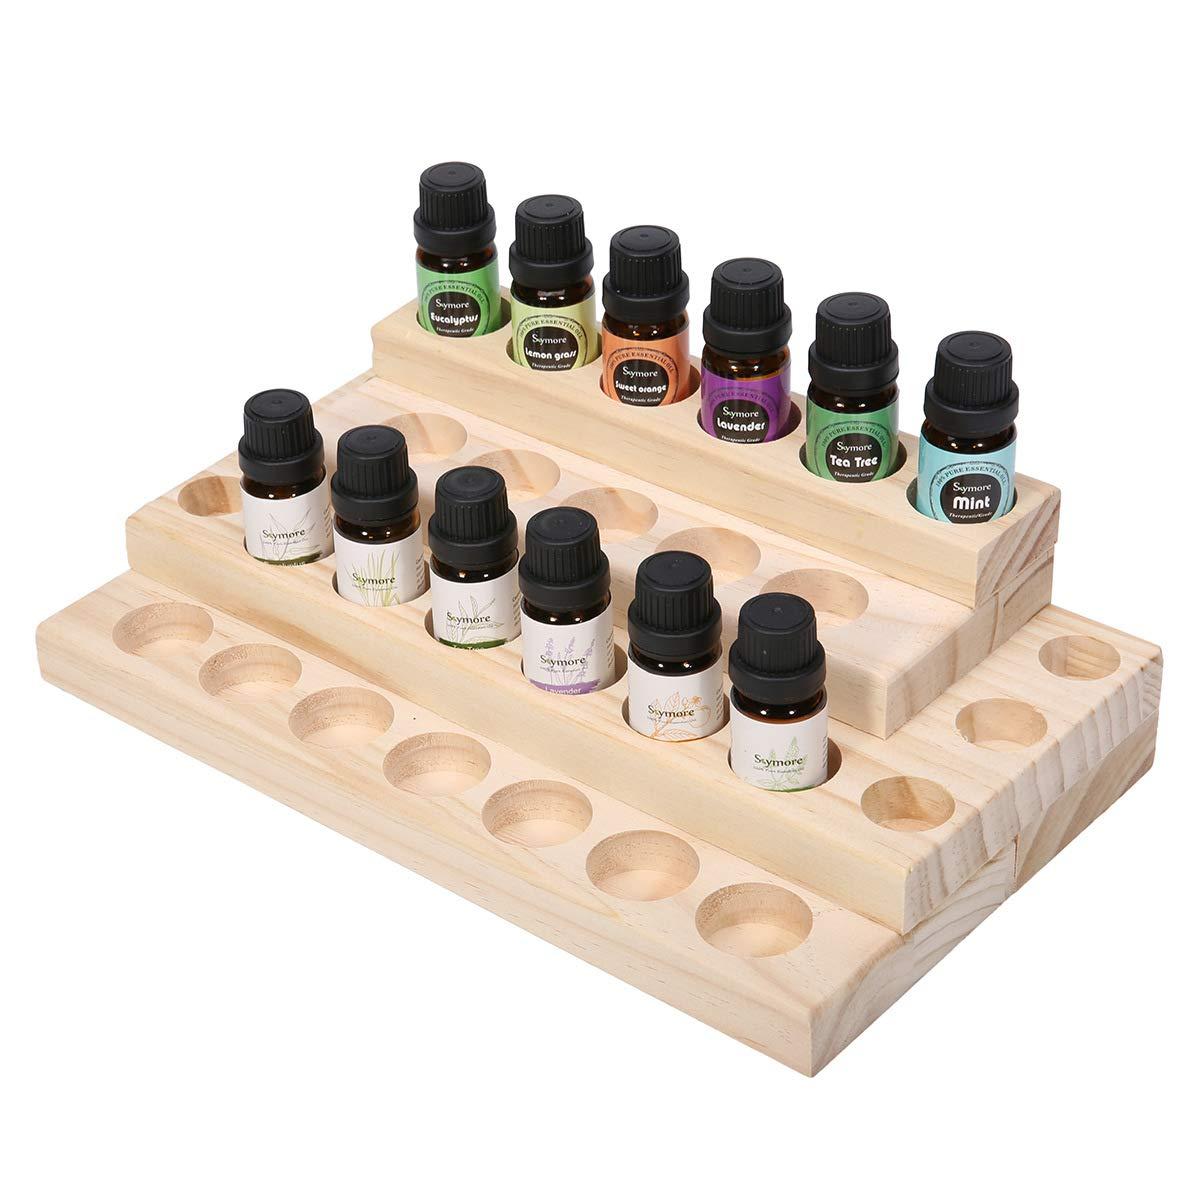 VolksRose 4-Tier Wooden Essential Oil Display Storage Organizer Rack Stand, Cosmetic Organizer Rack - Holder for 30 Pieces (5ml 10ml 15ml 20ml) Bottles #ob08